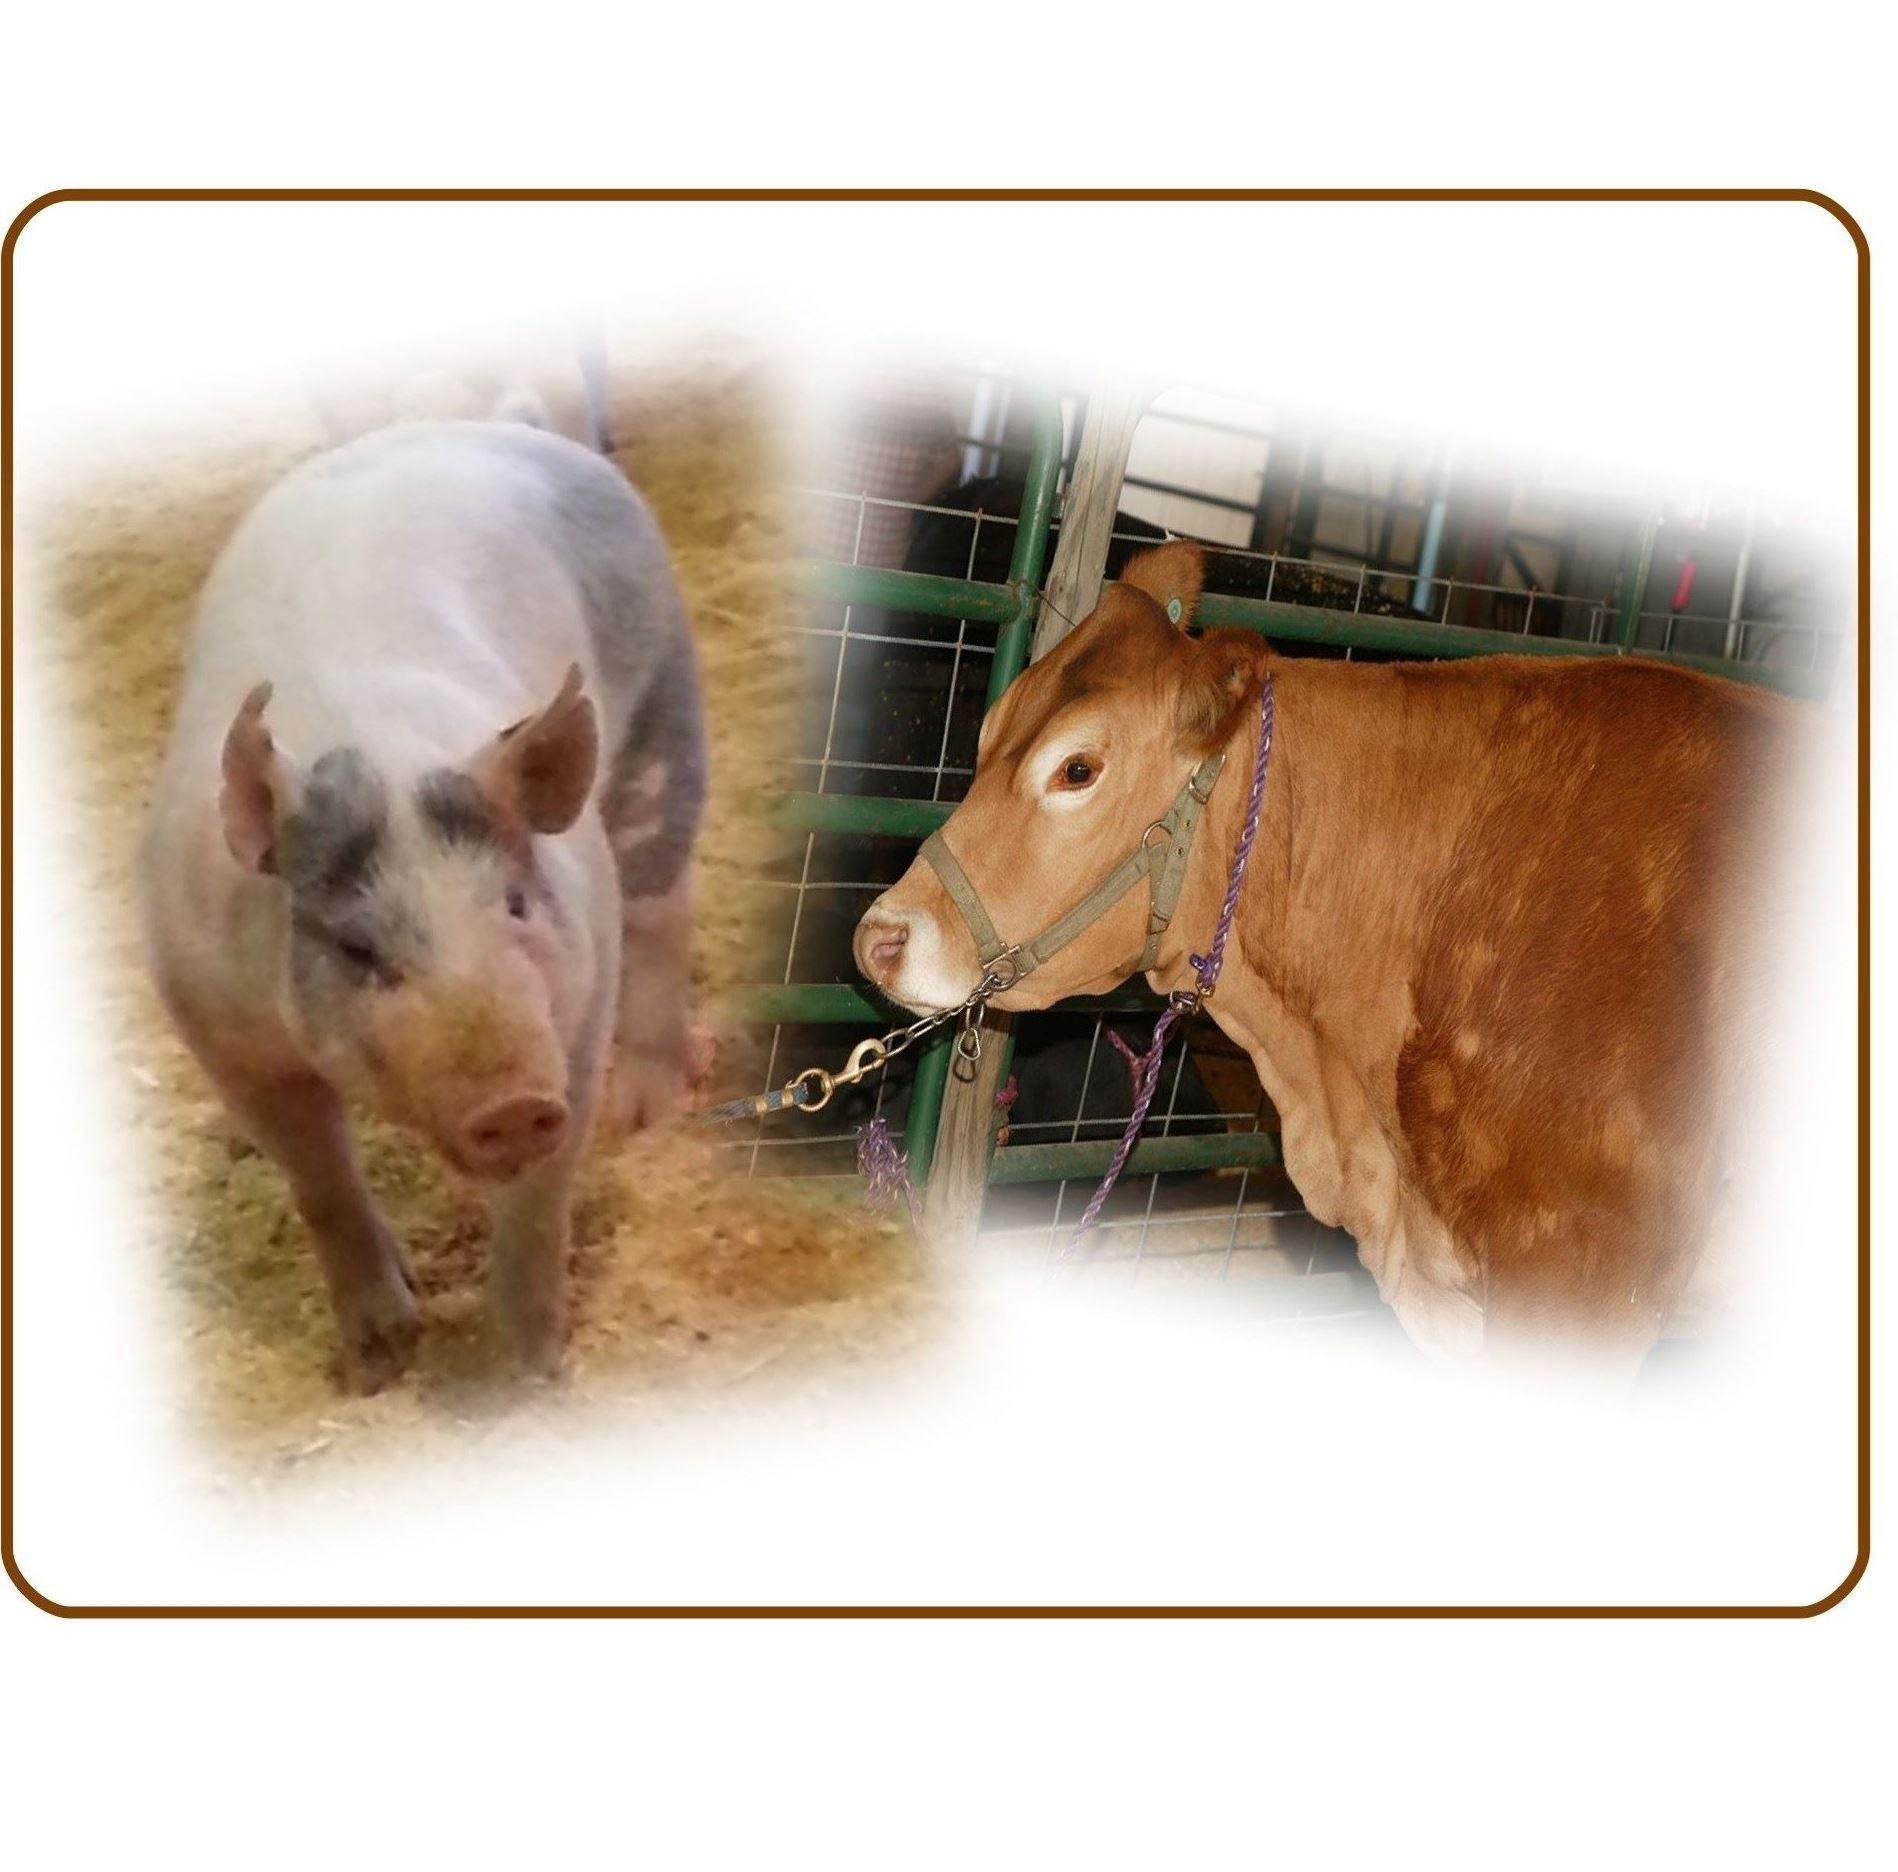 4H / Ffa Steer & Swine Sale Within Clay County Florida School Calendar 2021